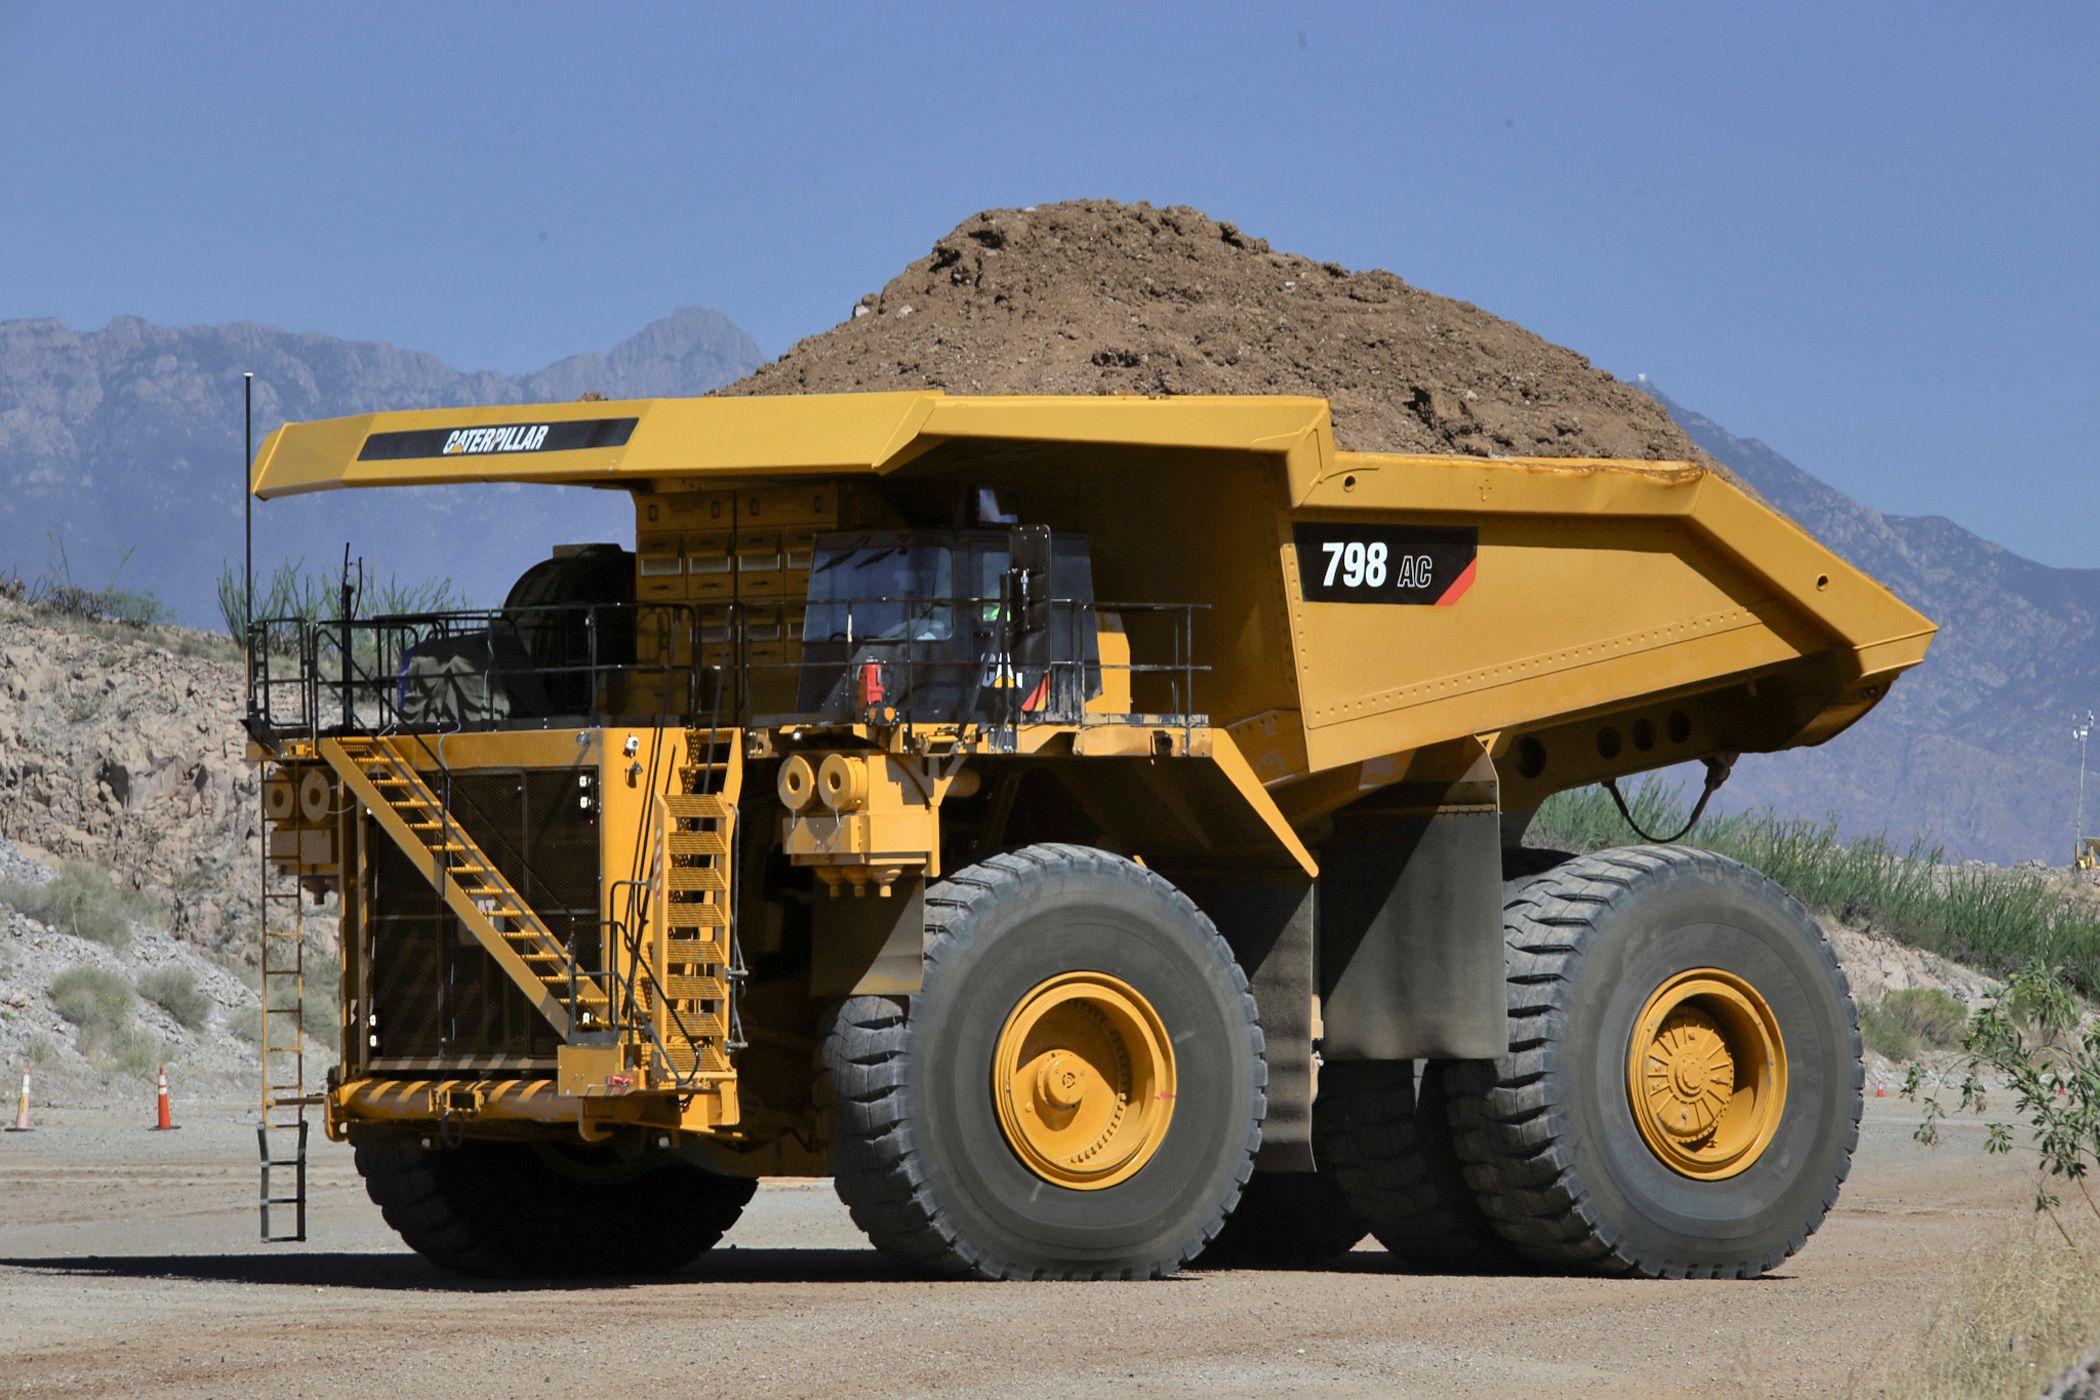 Cat 798 AC mining truck.